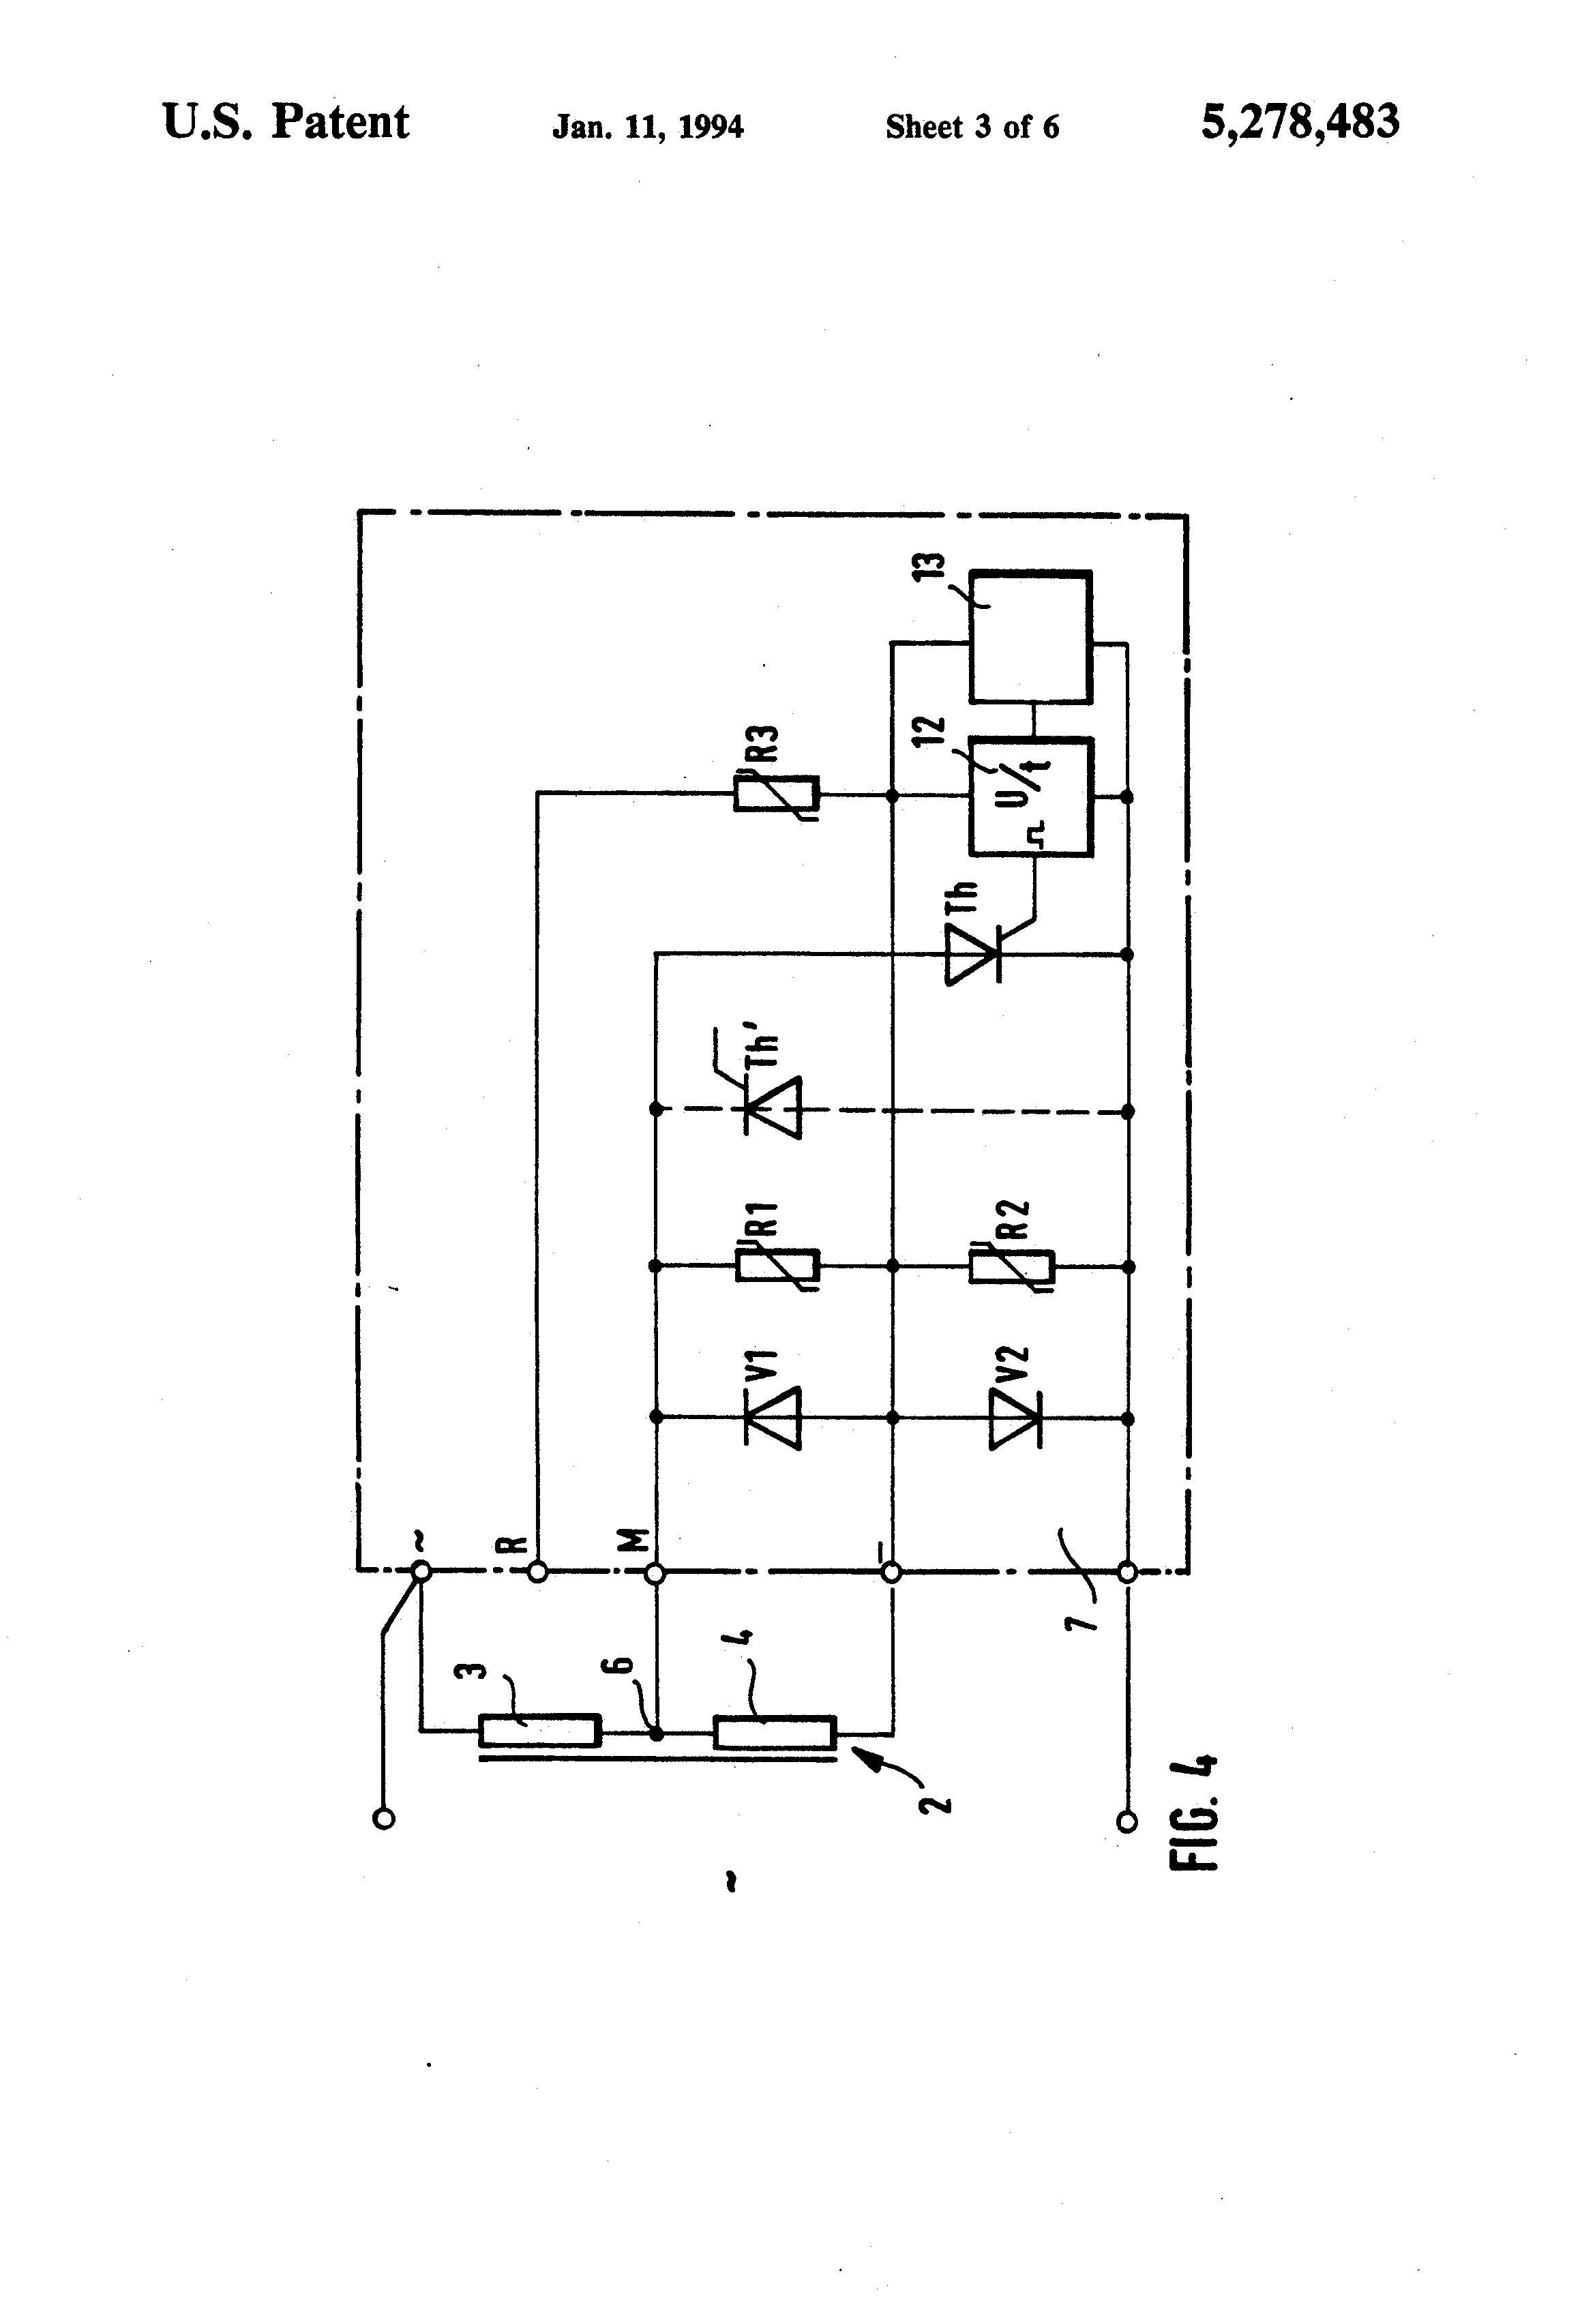 Diagram Sew Eurodrive 208 Volt Wiring Diagram Full Version Hd Quality Wiring Diagram Wiringdeadline Ccpr44 Fr